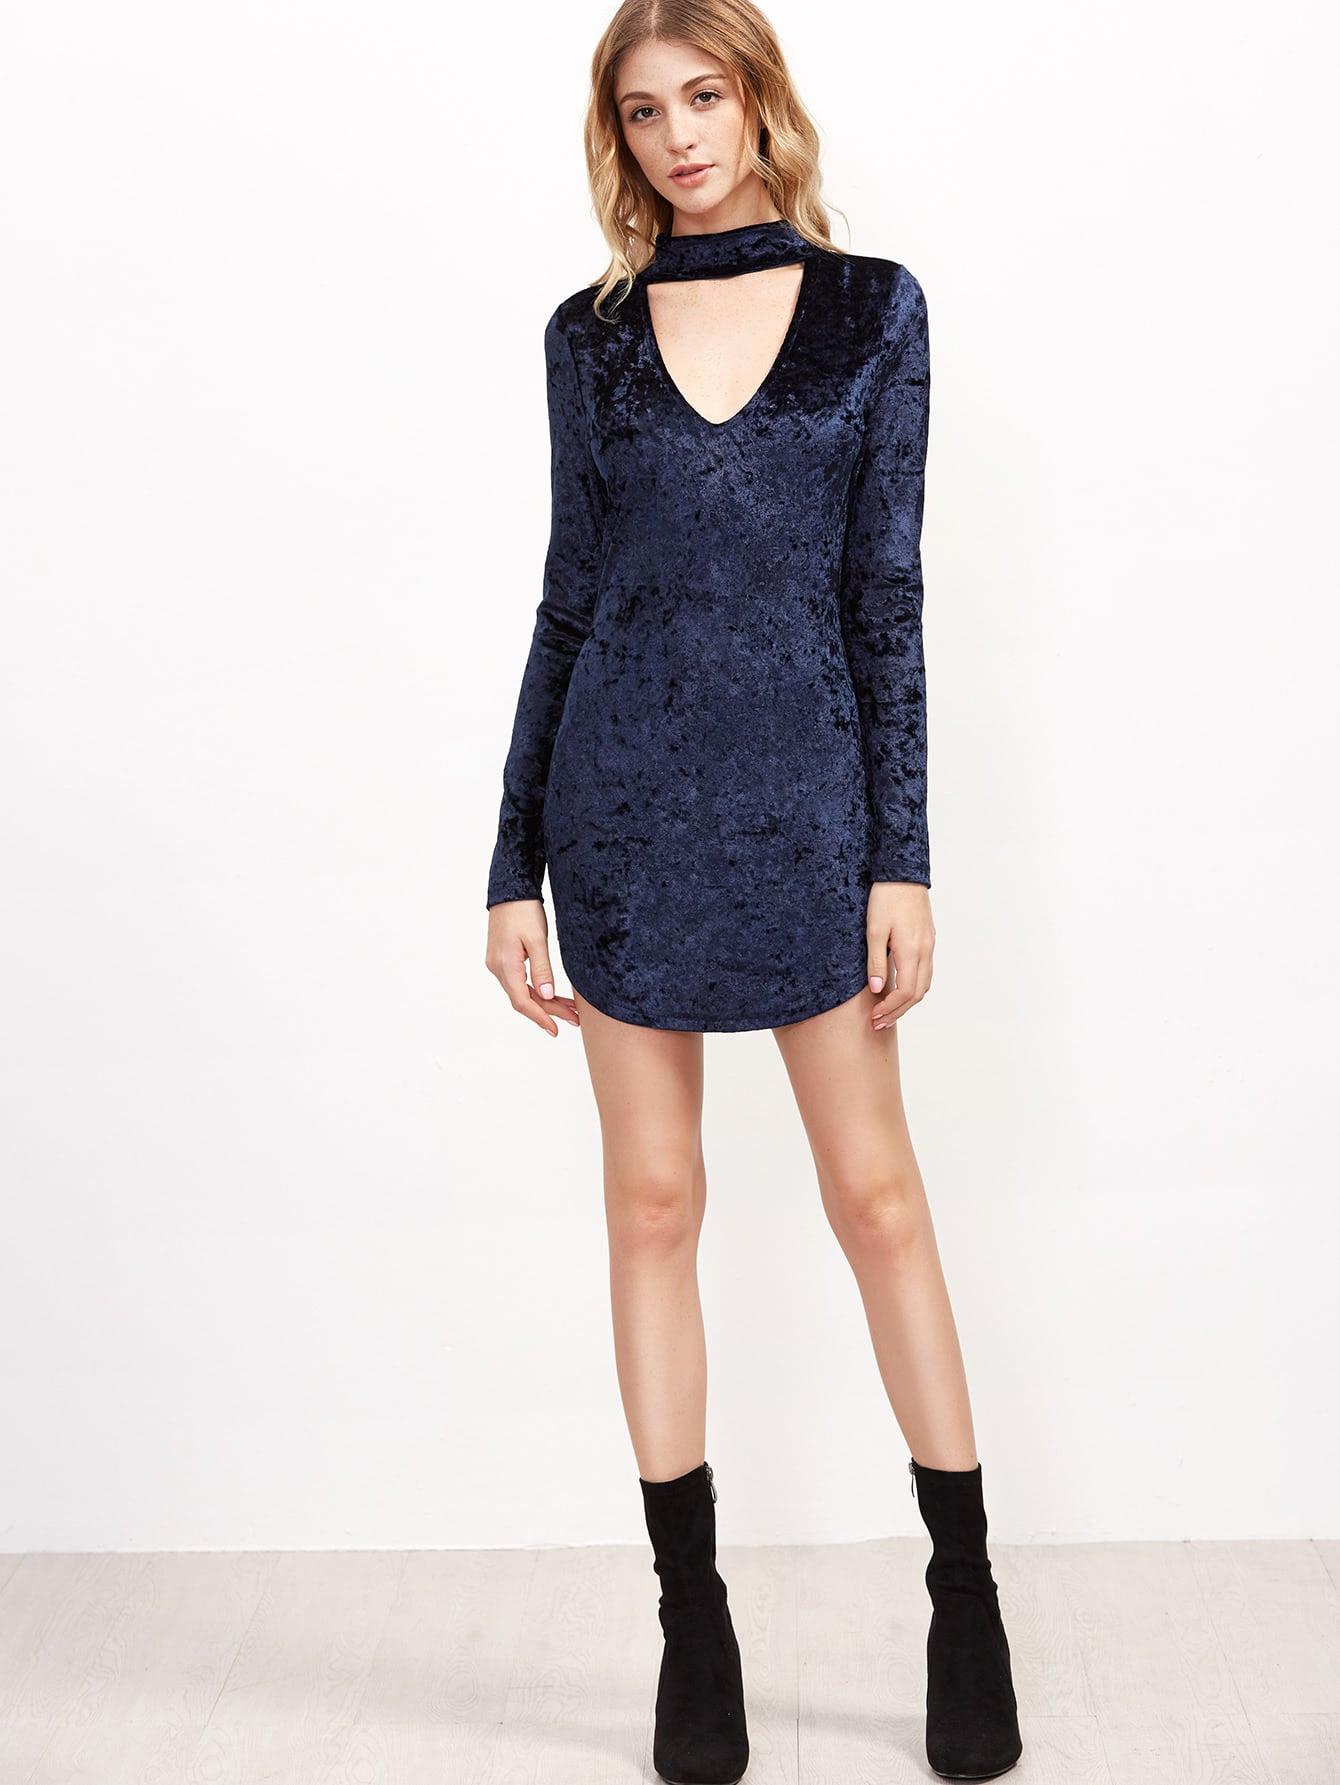 Kim kardashian Hooded Drawstring Plain Long Sleeve Casual Dresses london scottsdale